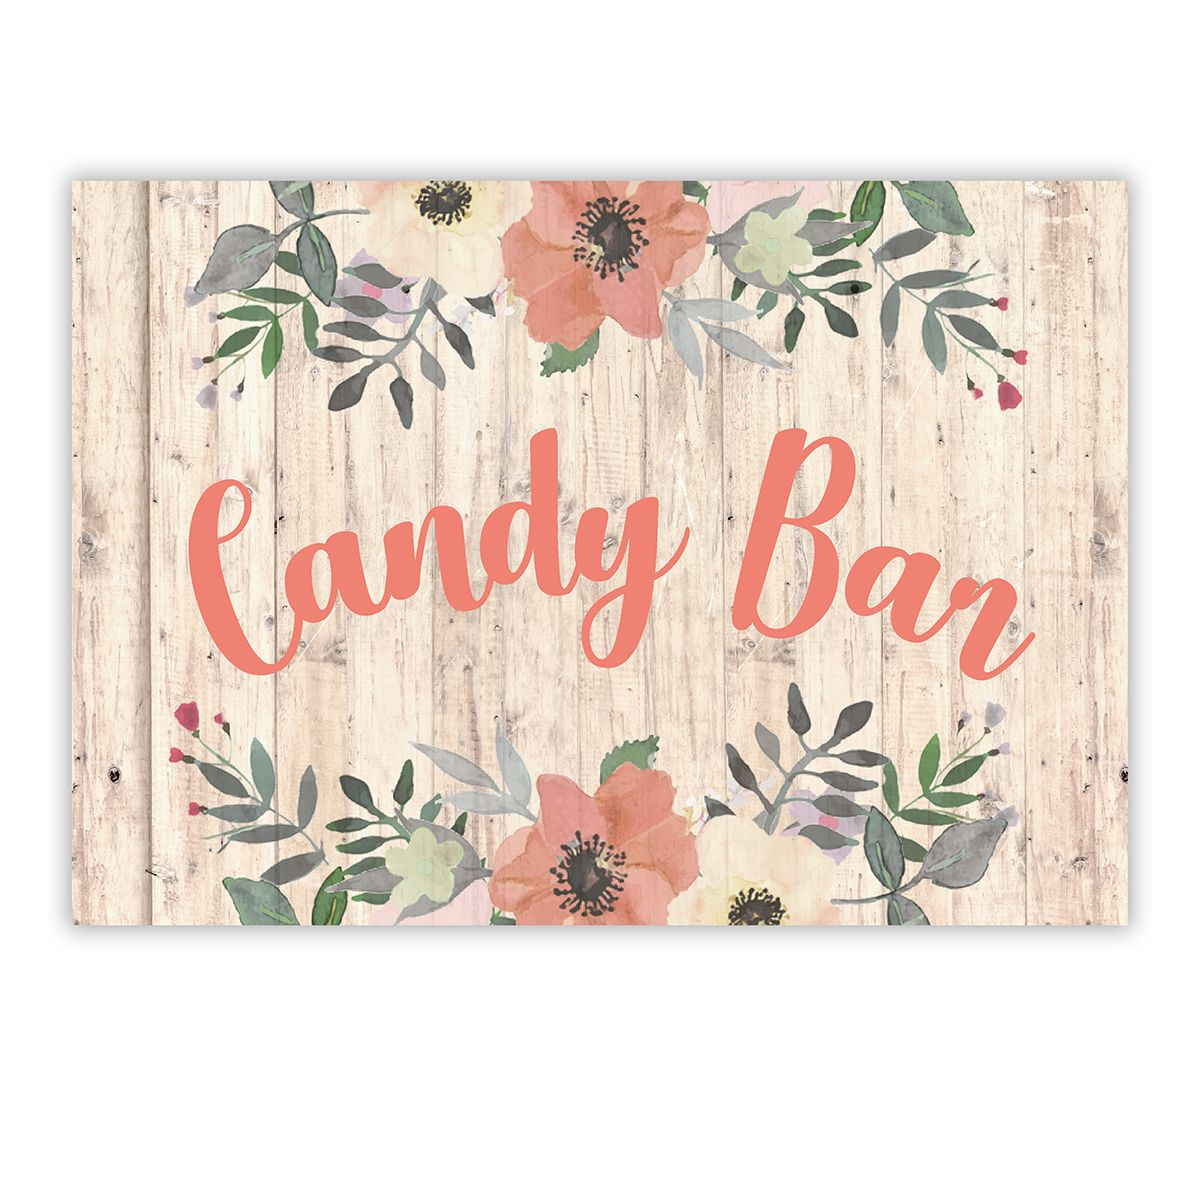 Cartel Candy Bar Liza A4